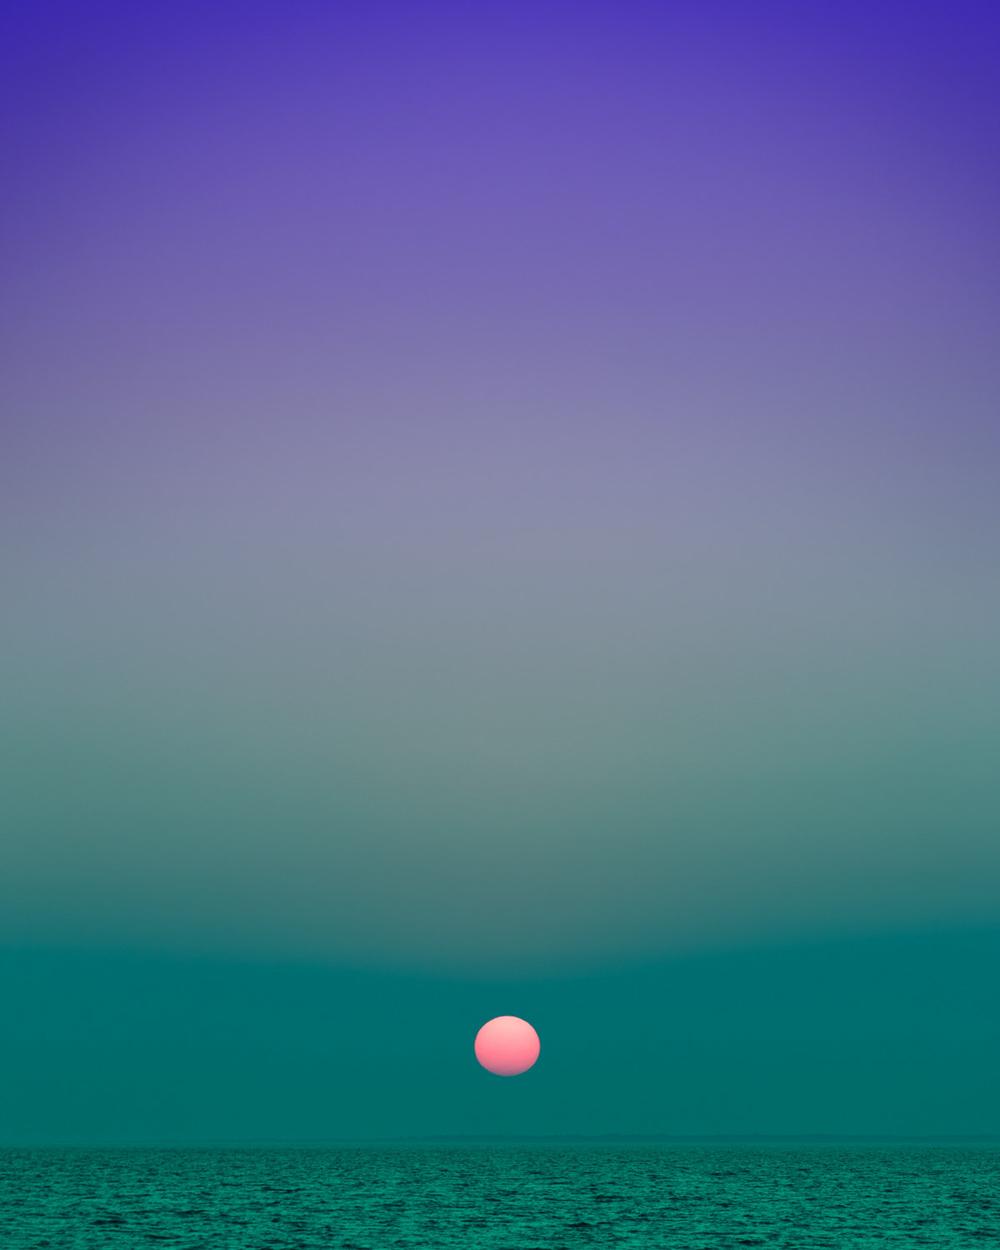 Fort-Pond-Bay-Montauk-NY-Sunset-8.10pm-9.1.10.jpg